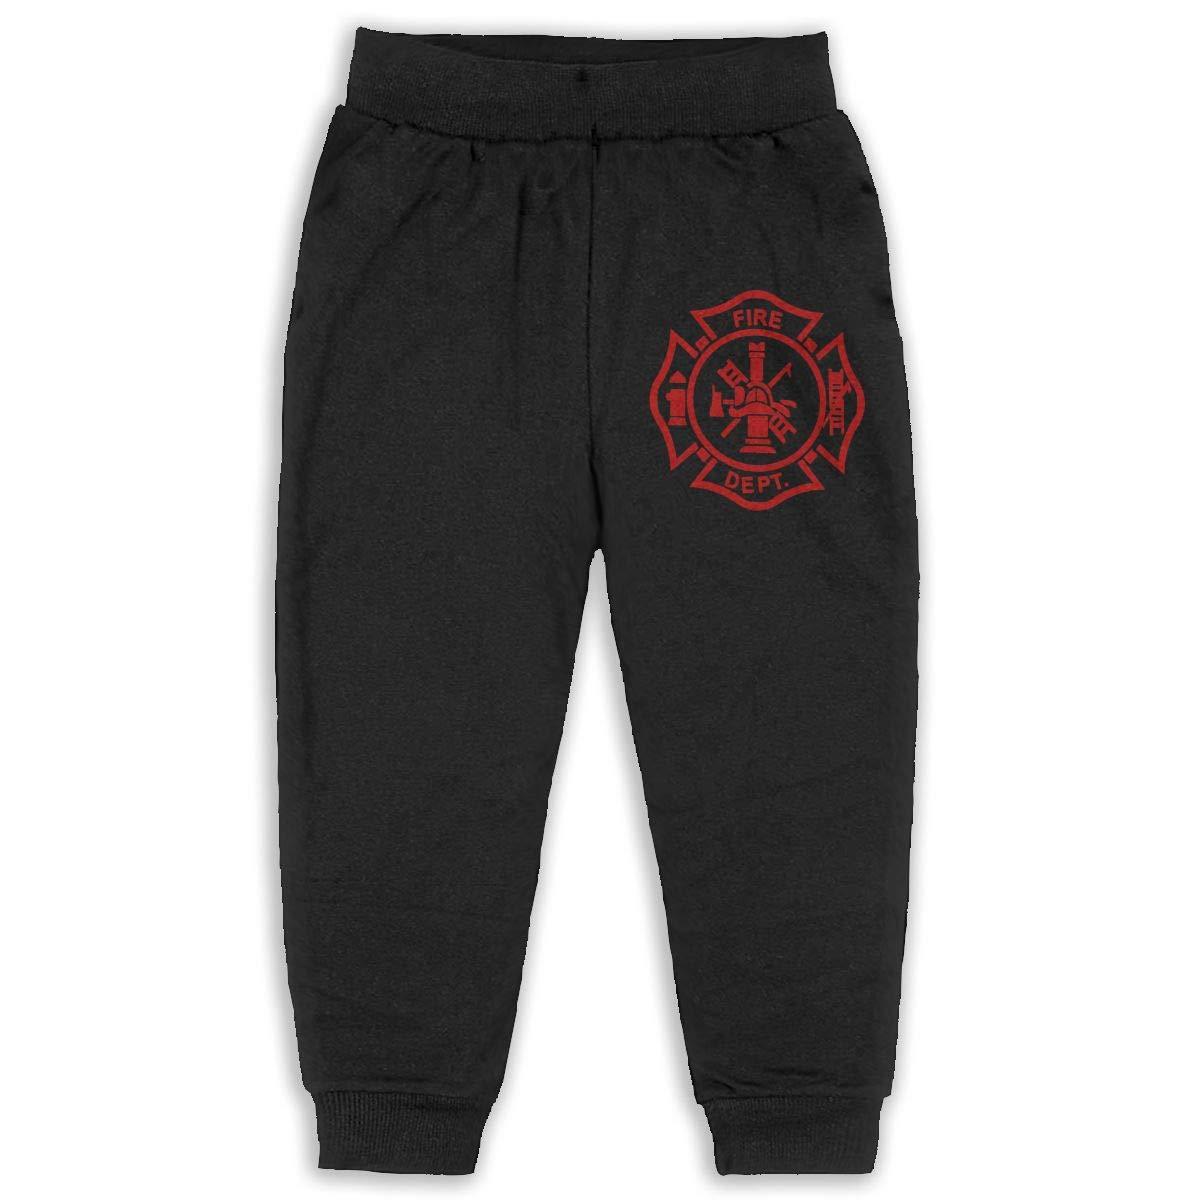 ELCW37K Kids /& Toddler Pants Soft Cozy Baby Sweatpants Firefighter Fleece Pants Athletic Pants